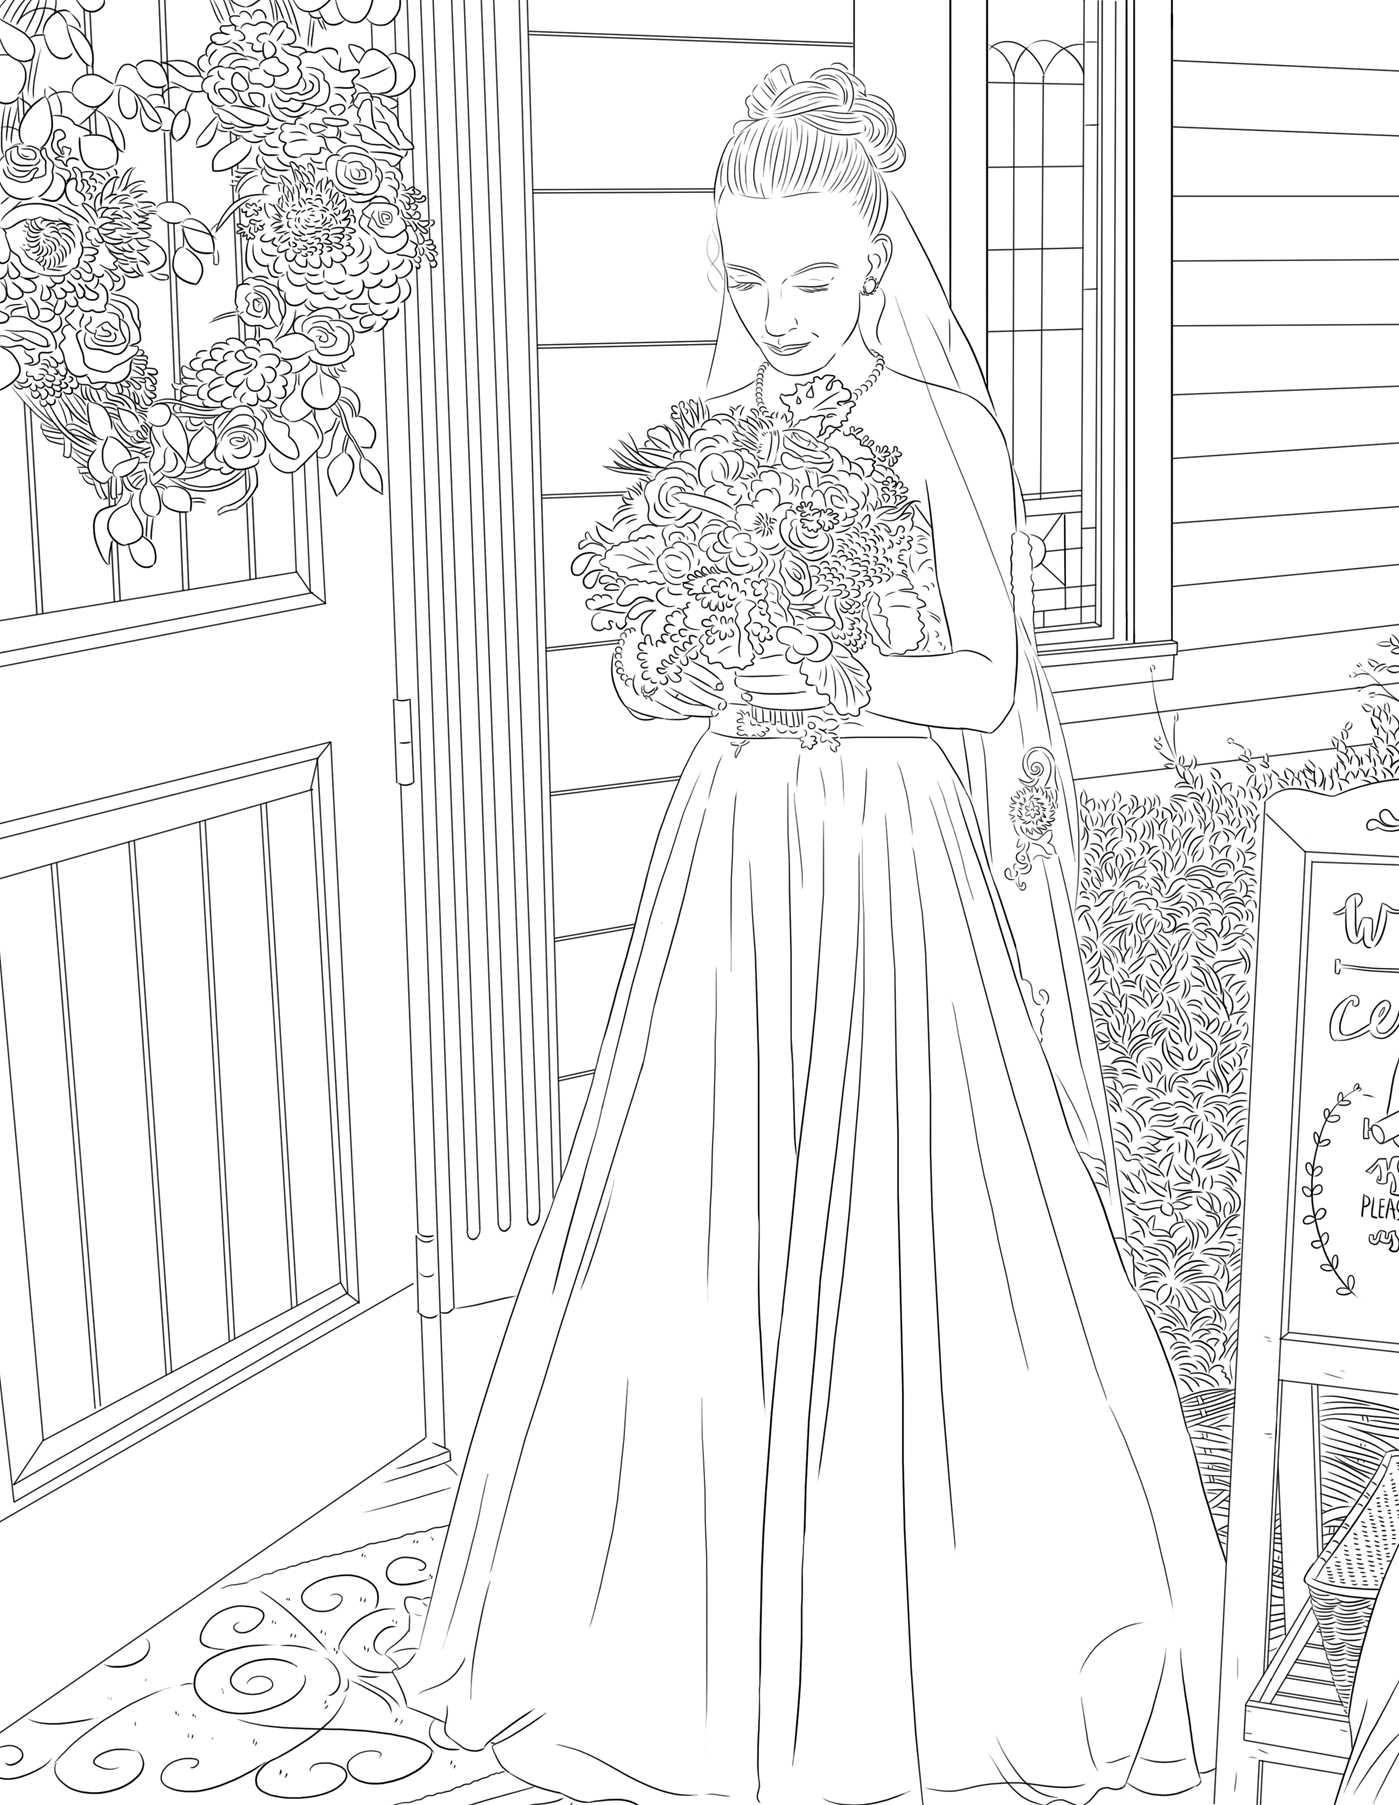 Maci Bookout Wedding | The Maci And Taylor Wedding Album Book By Maci Bookout Taylor